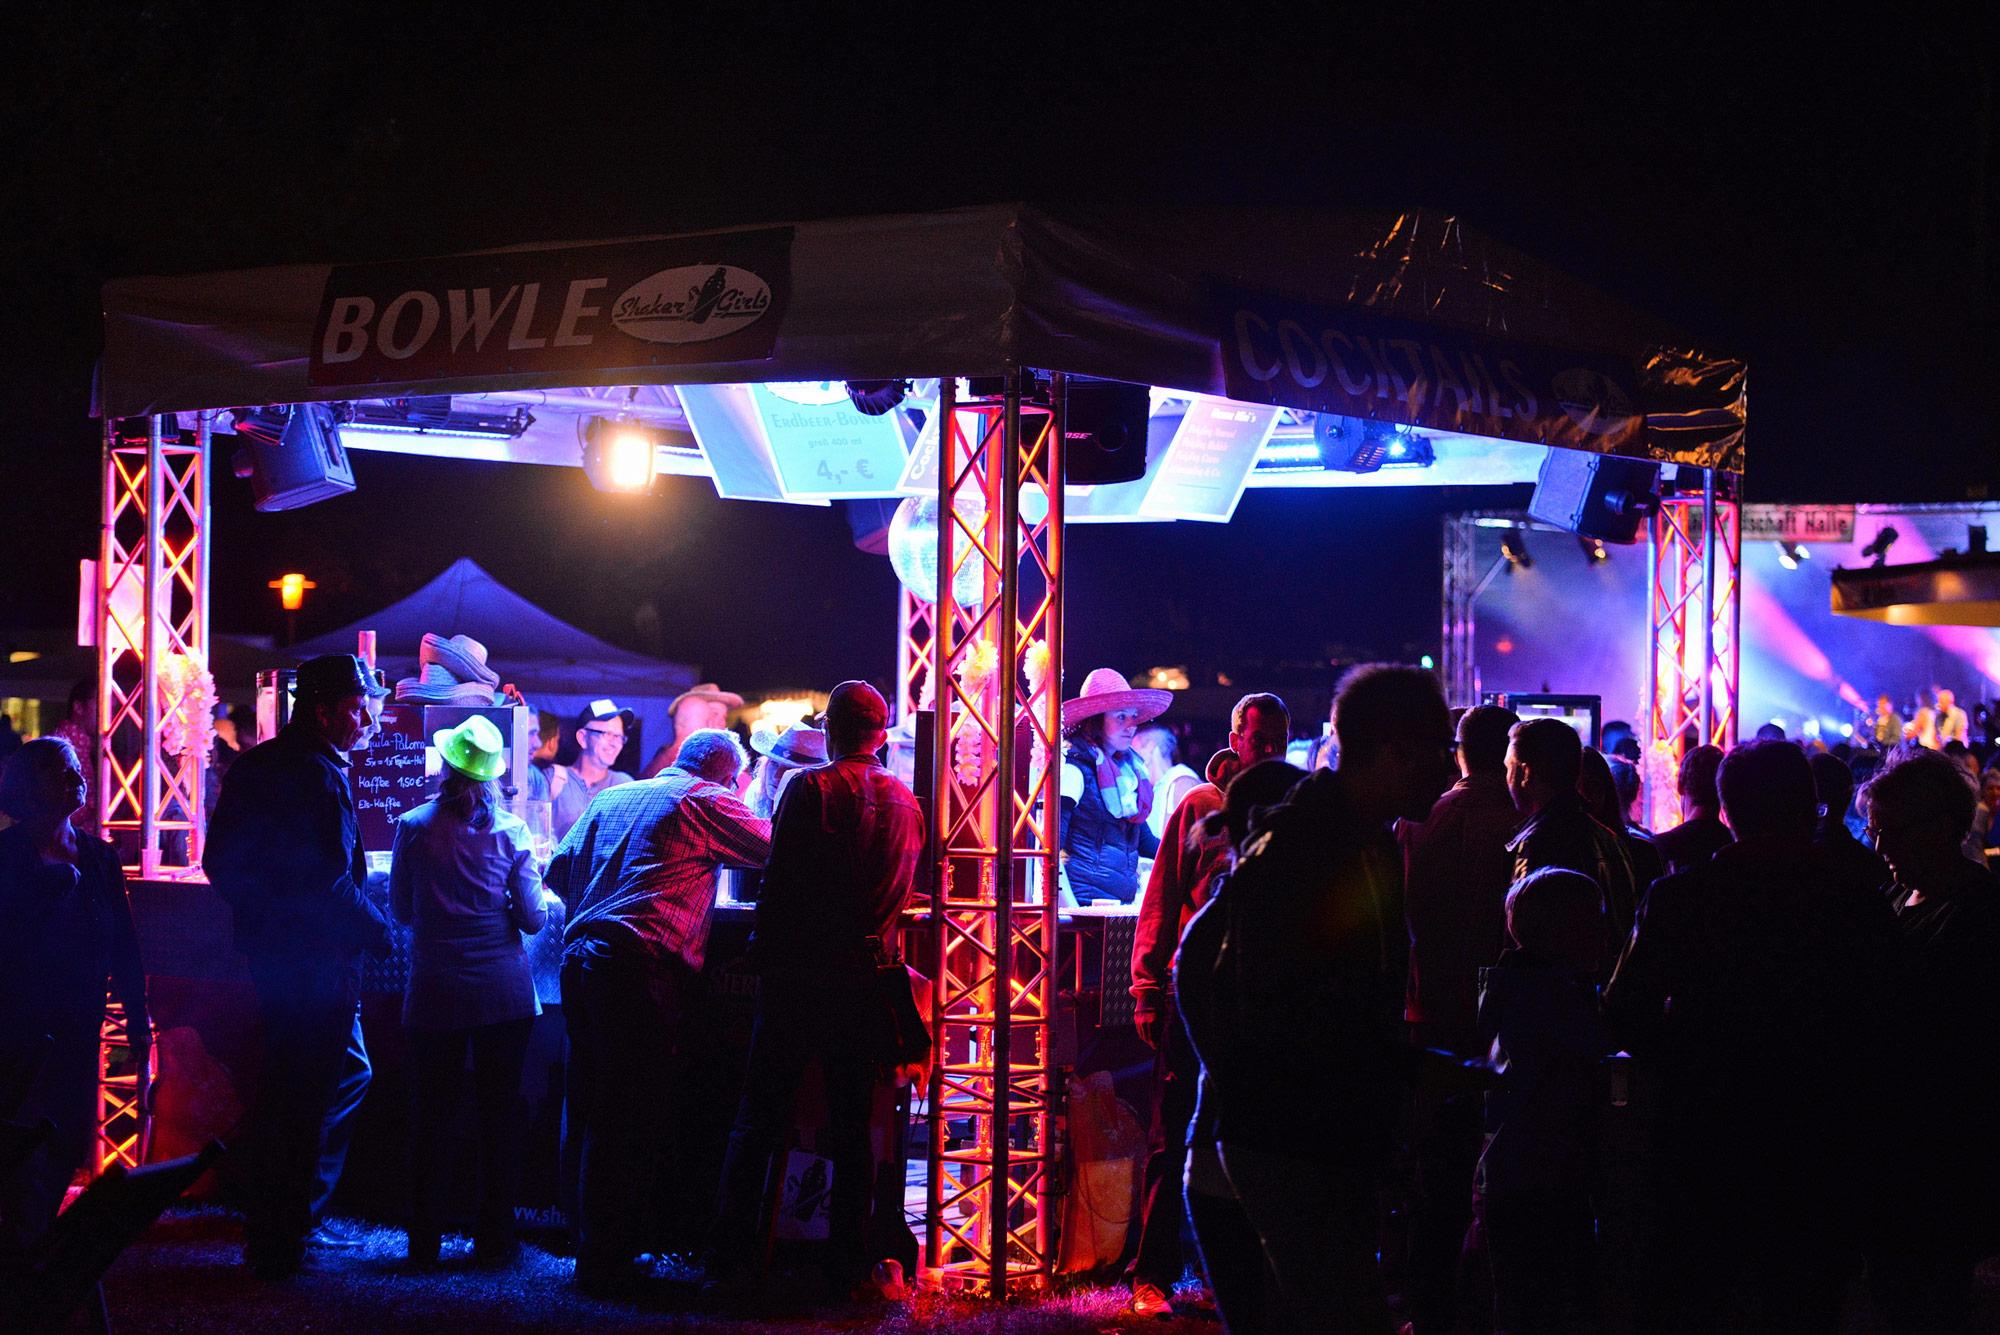 Public Events, Stadtfeste & Festivals